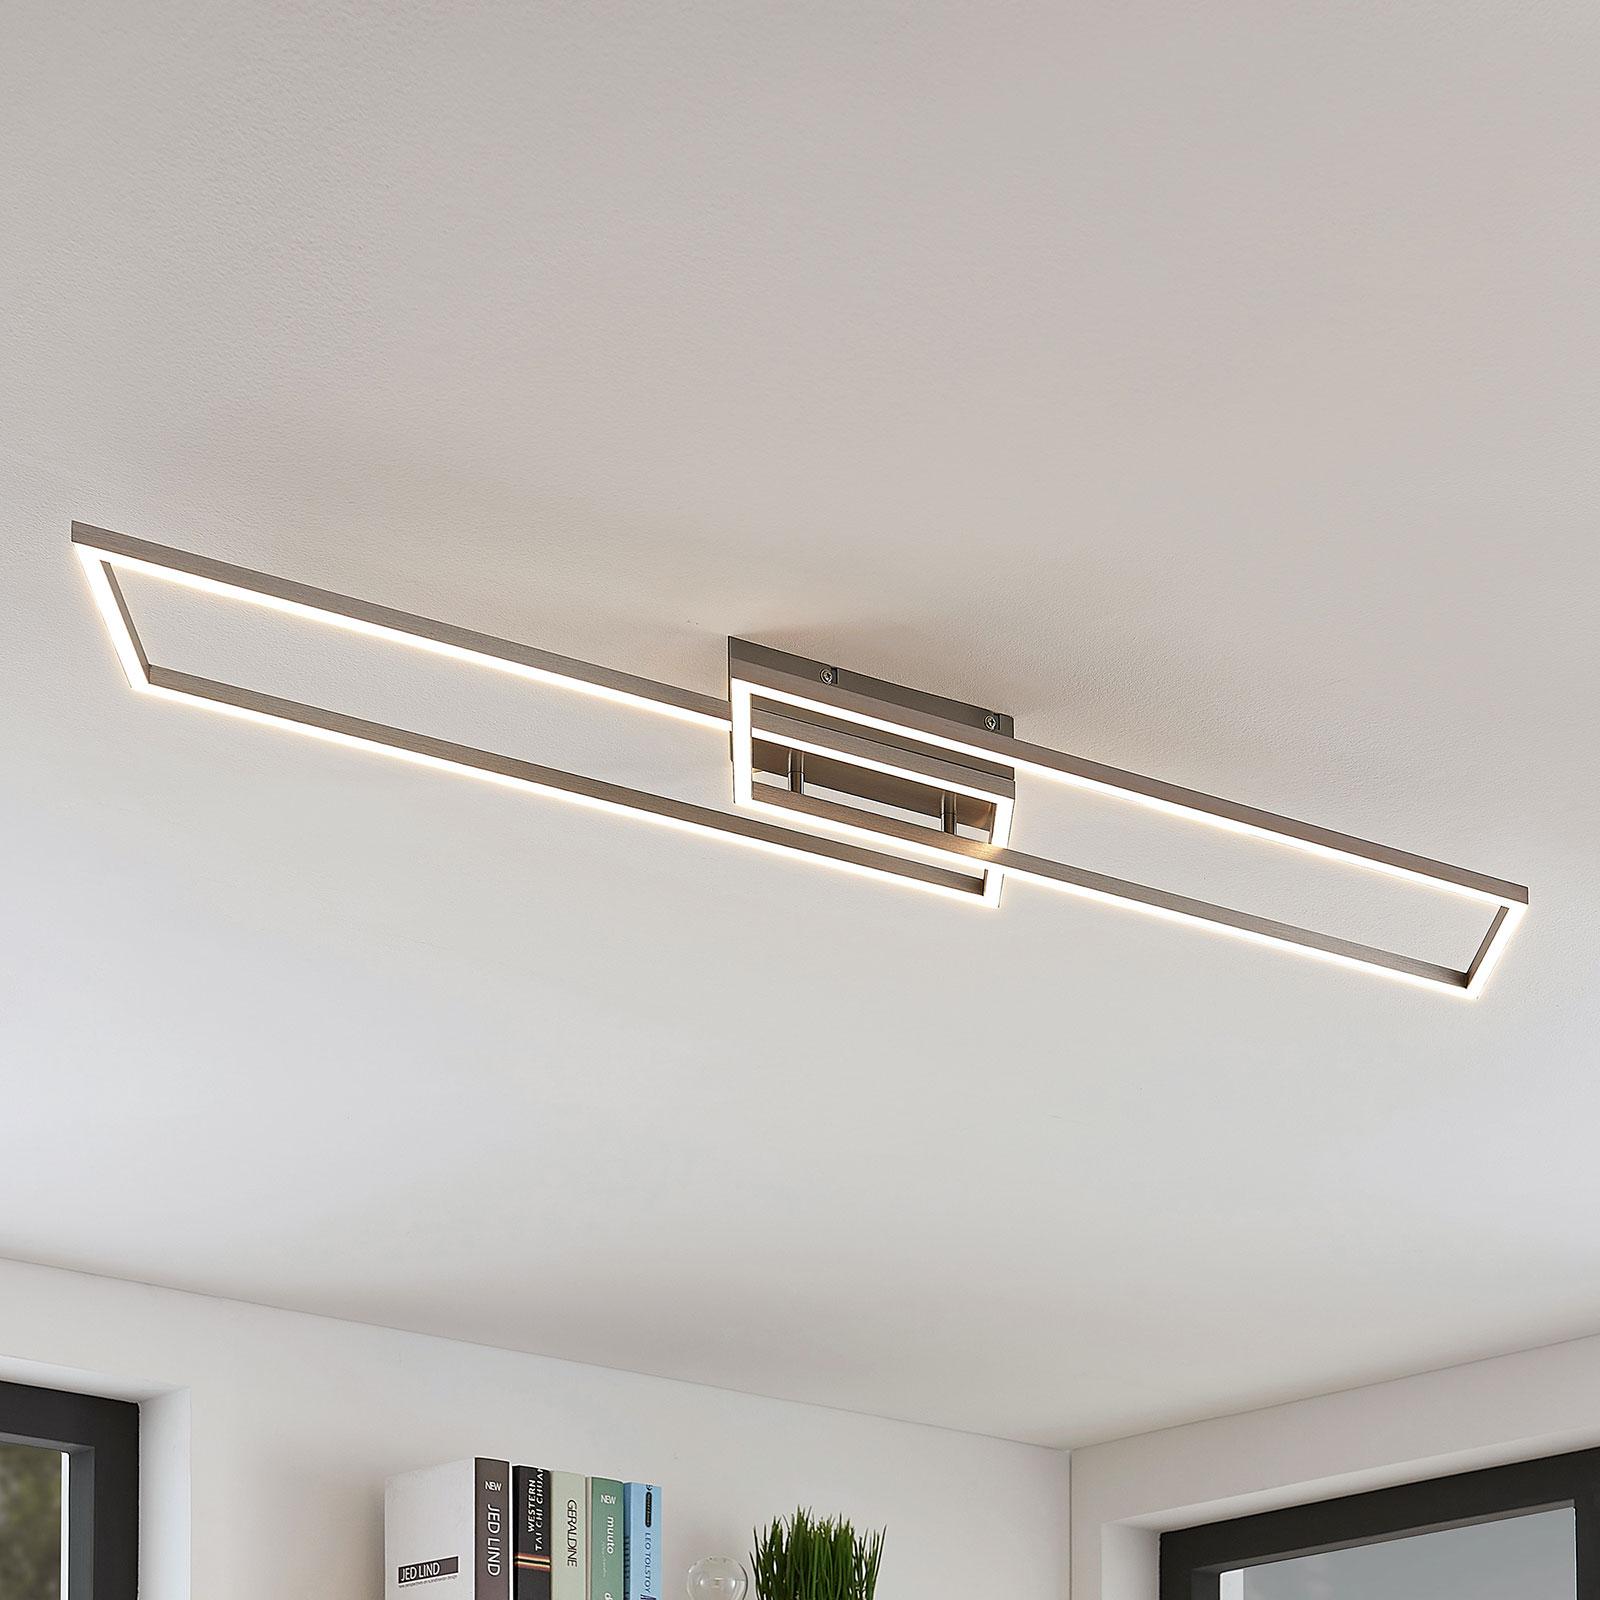 Rak LED-taklampa Quadra, dimbar